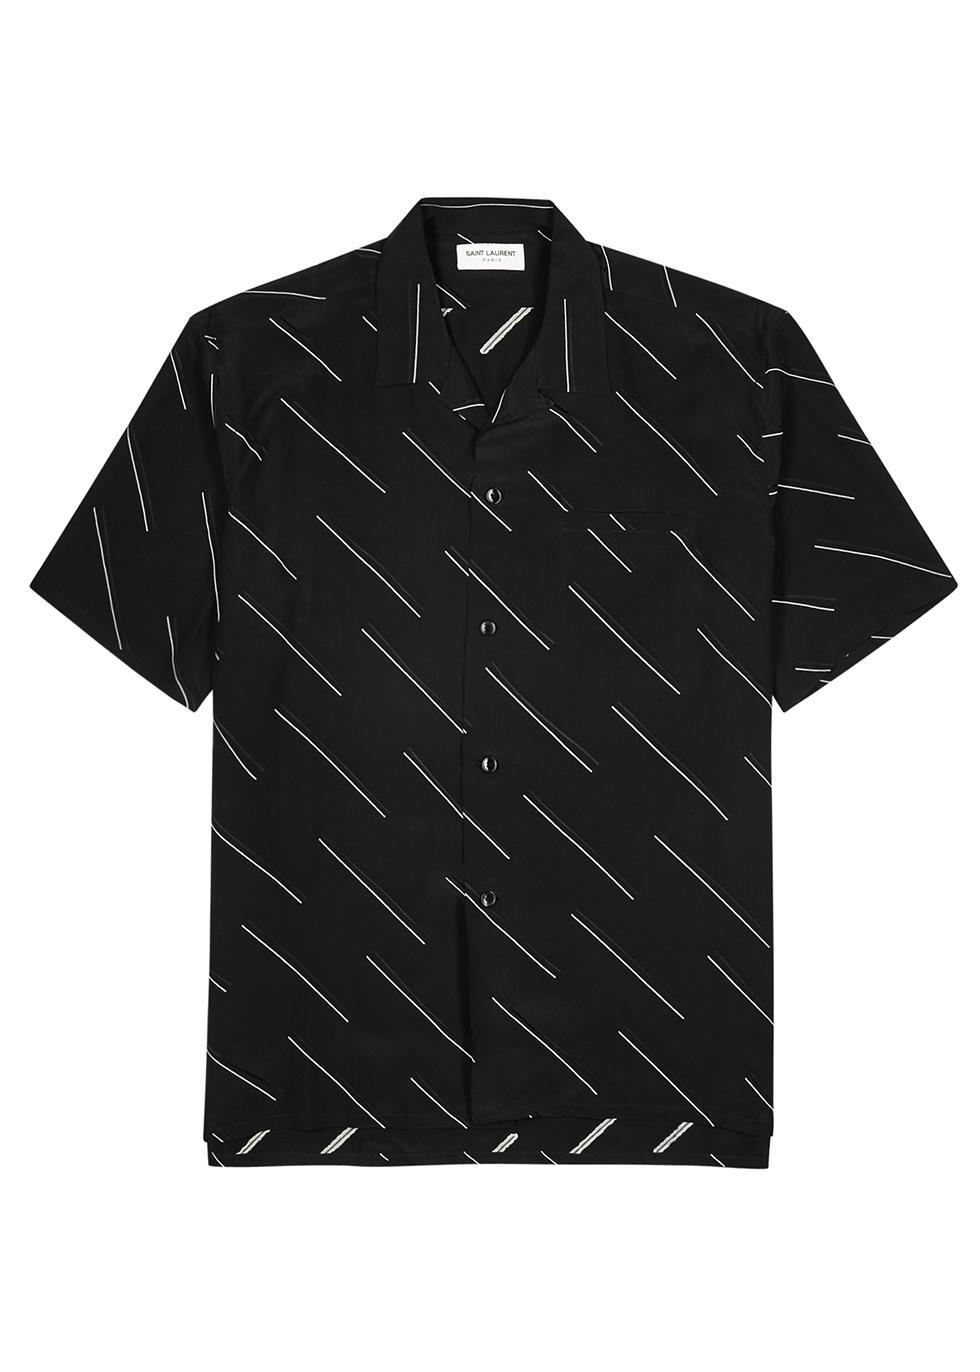 Black striped silk crepe de chine shirt